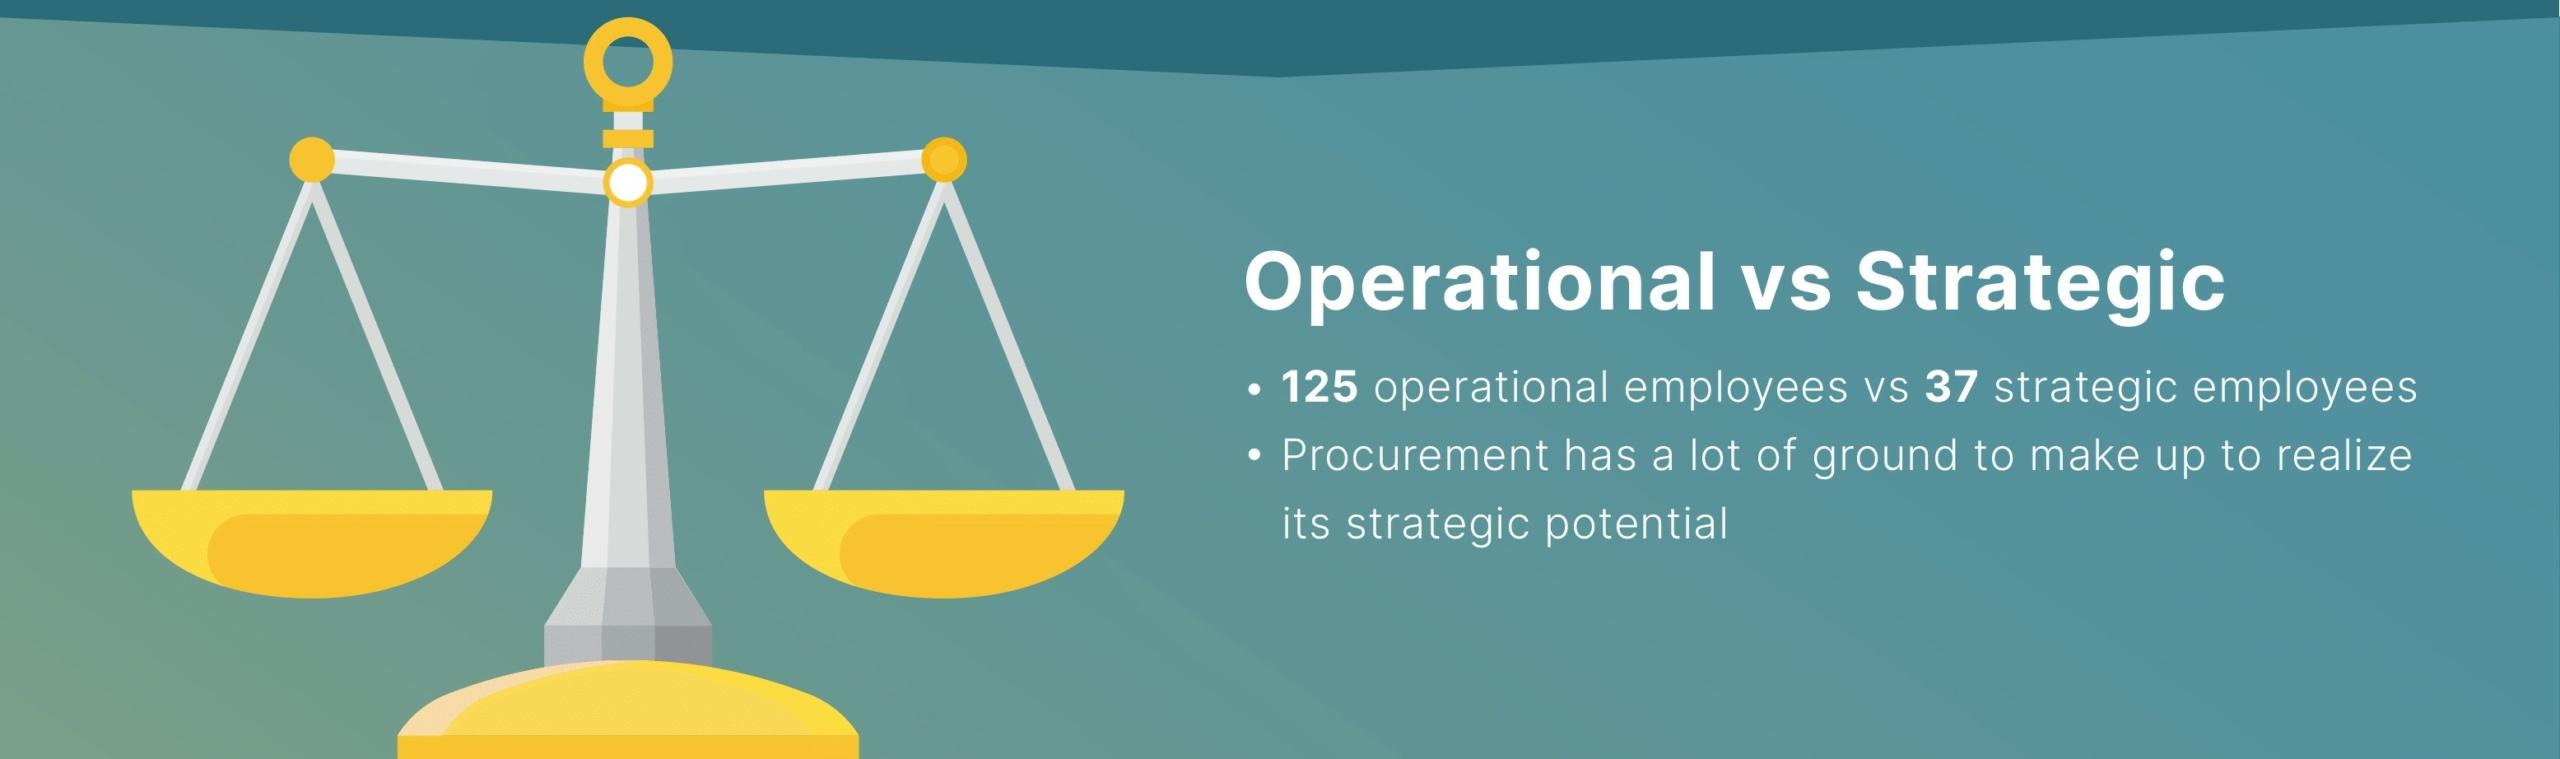 Operational vs Strategic